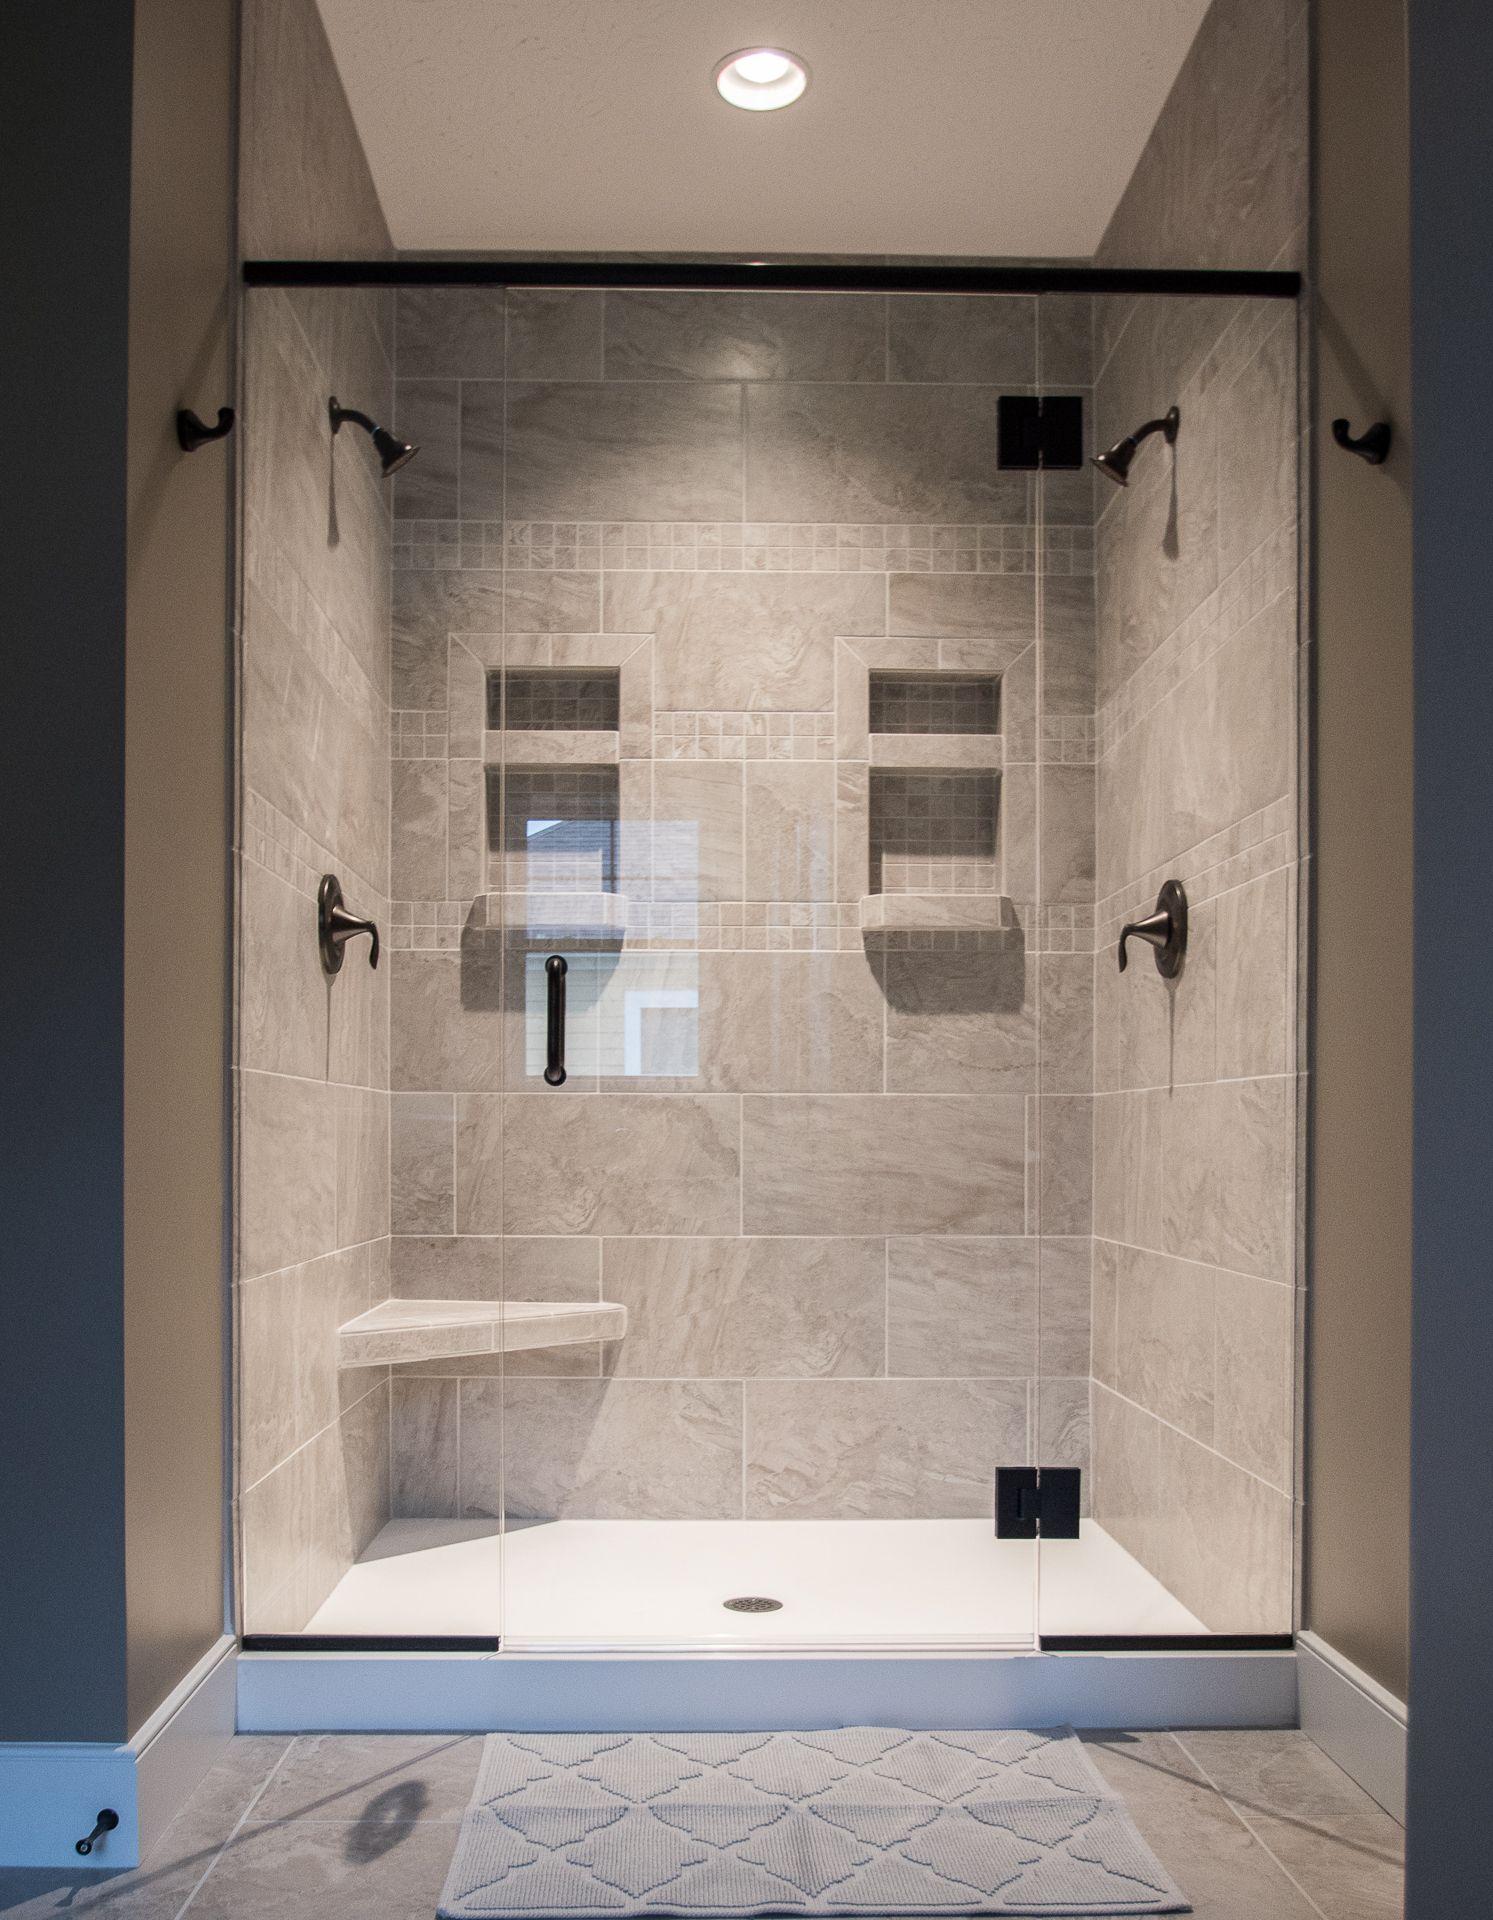 Bathrooms Harlow Builders Inc Shower Wall Tile Shower Tile Patterns Bathroom Shower Walls